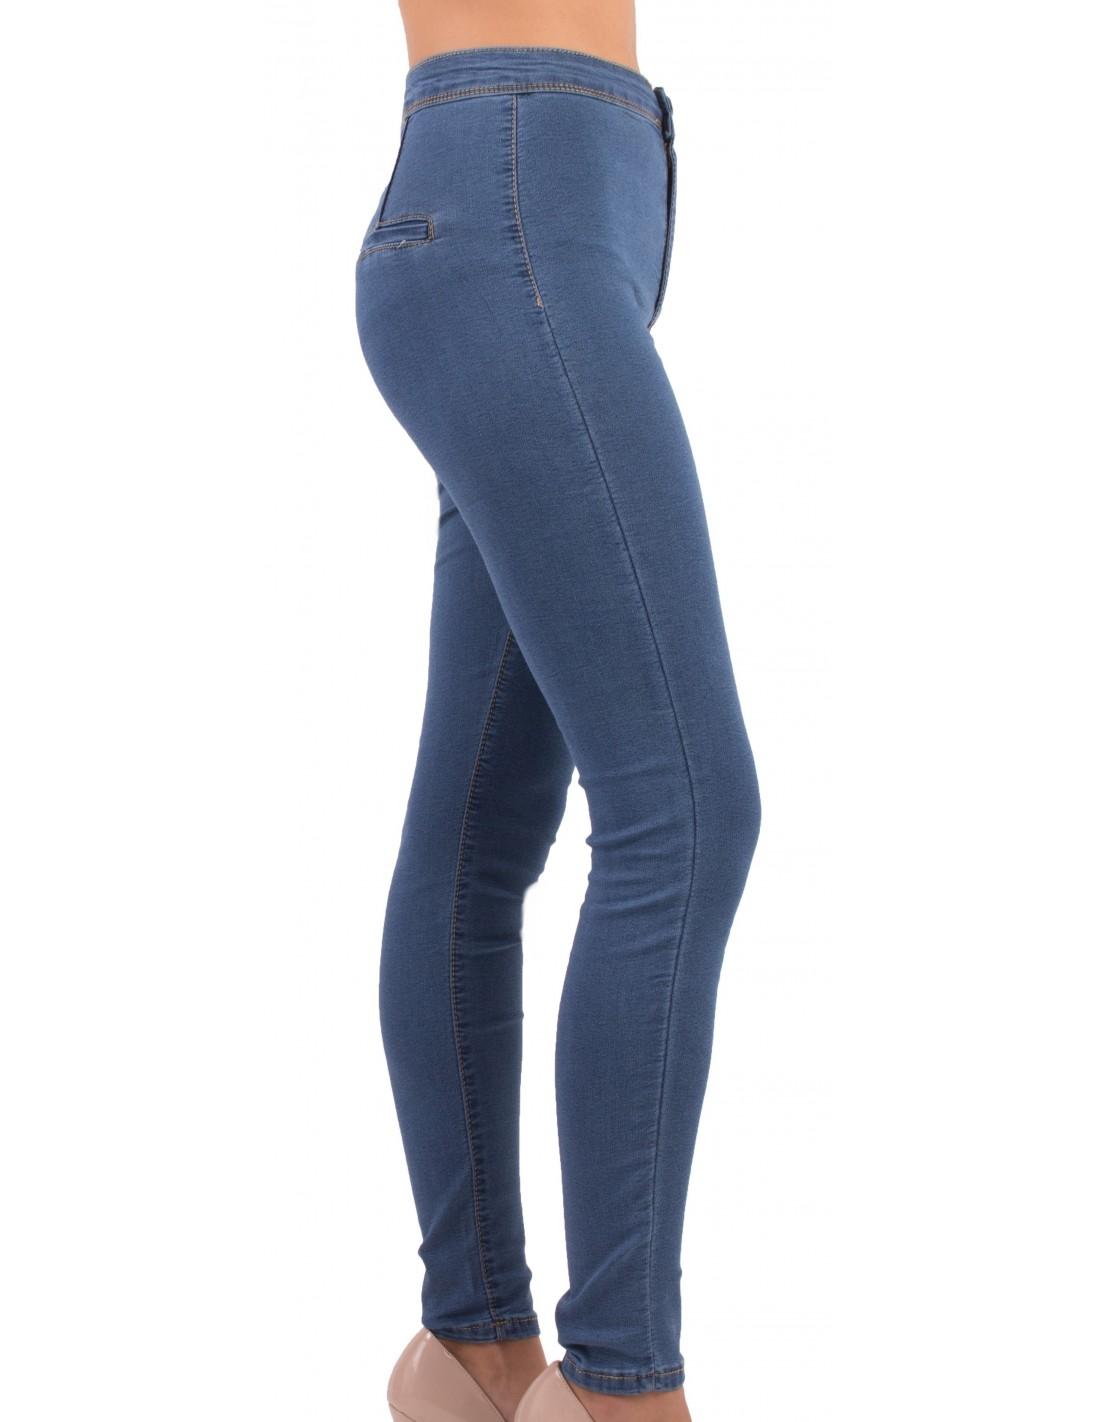 4d72d589df1 Jean femme skinny taille haute bleu jean stretch effet gainant bleu